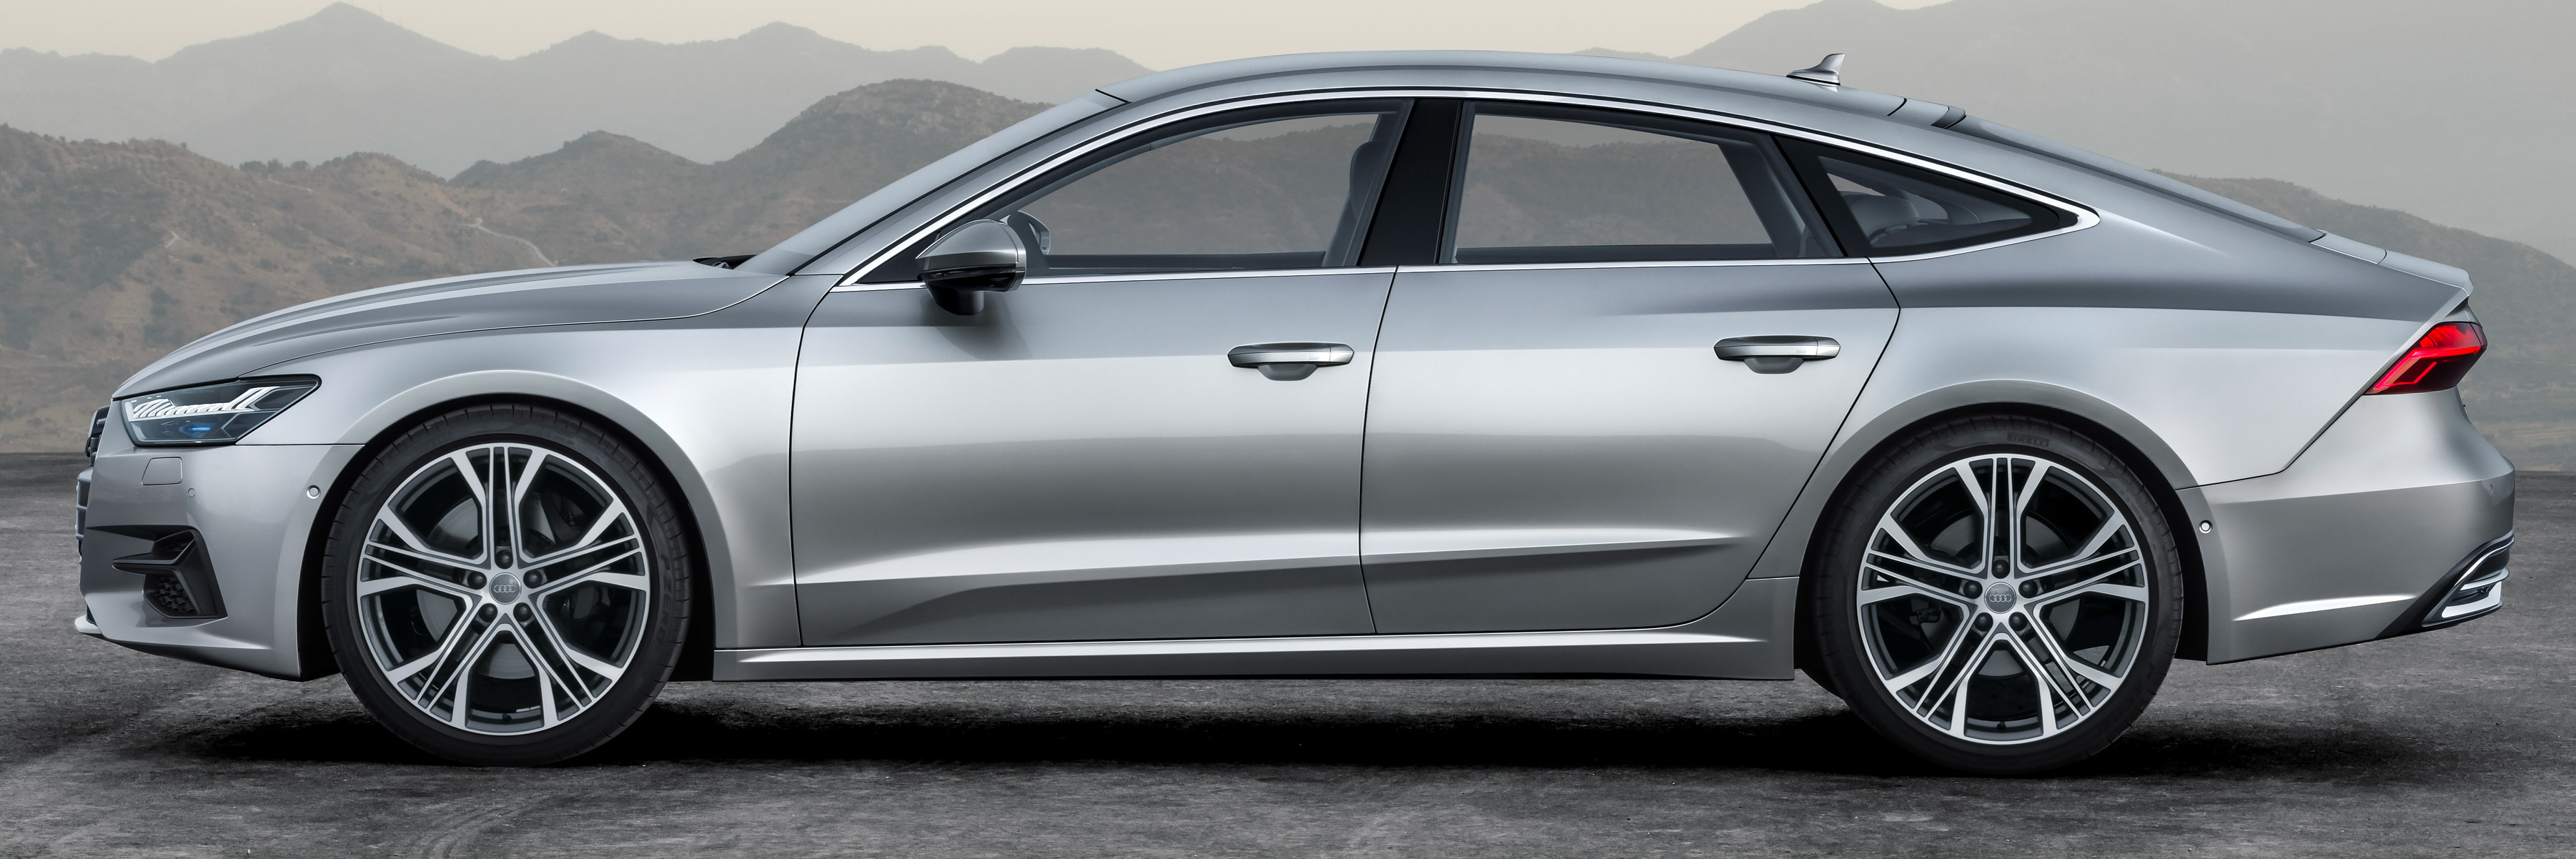 2017 Audi A7 >> 2018 Audi A7 Sportback – all models hybrid, Audi AI Paul Tan - Image 726246